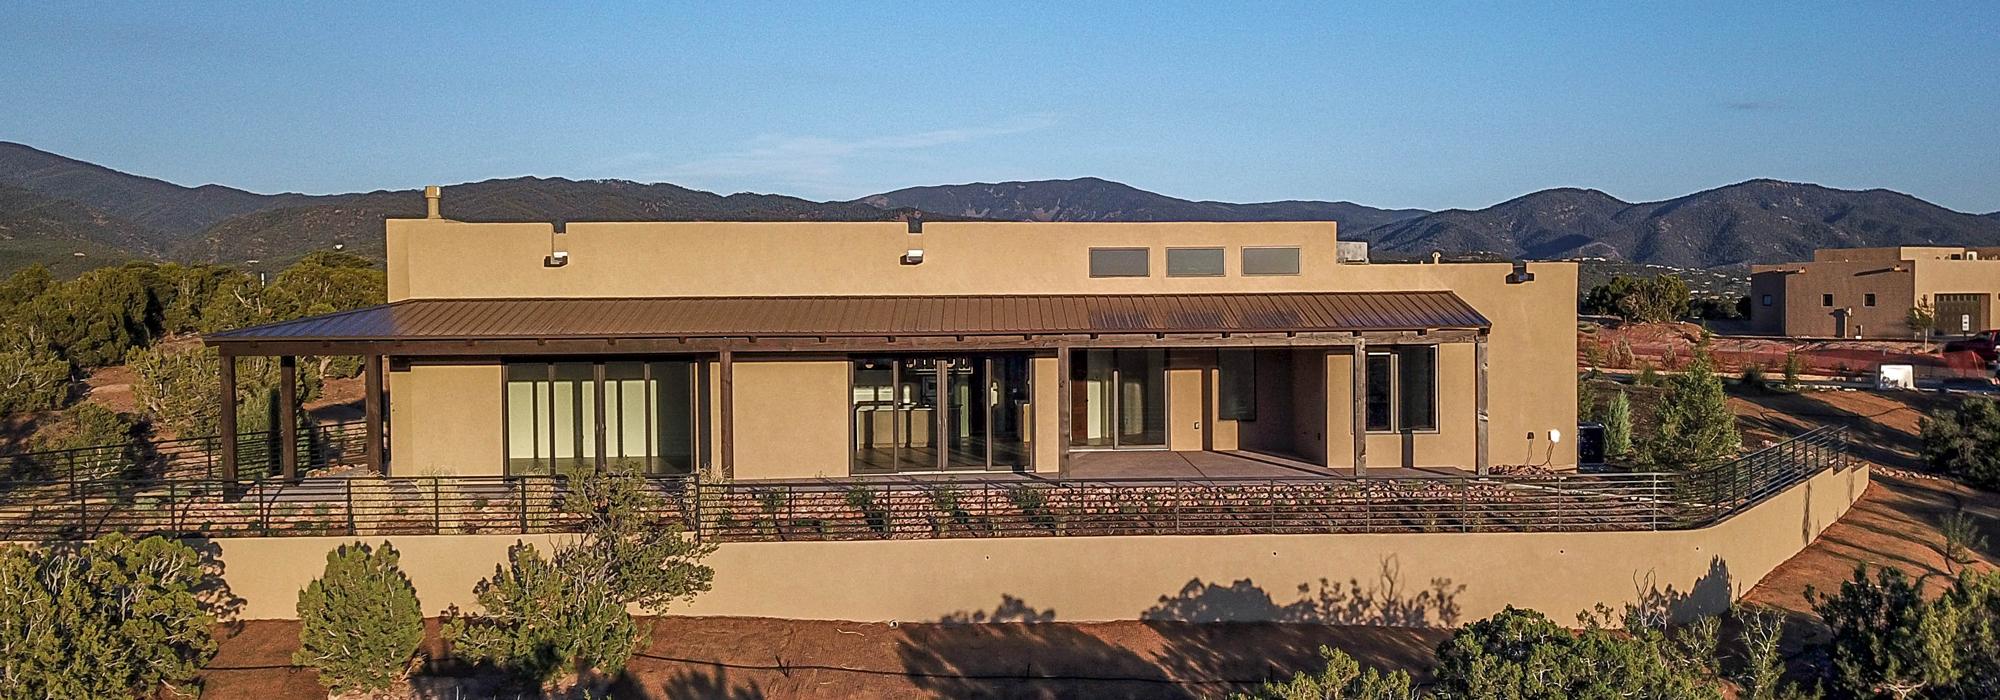 New Construction Homes For Sale Santa Fe Real Estate